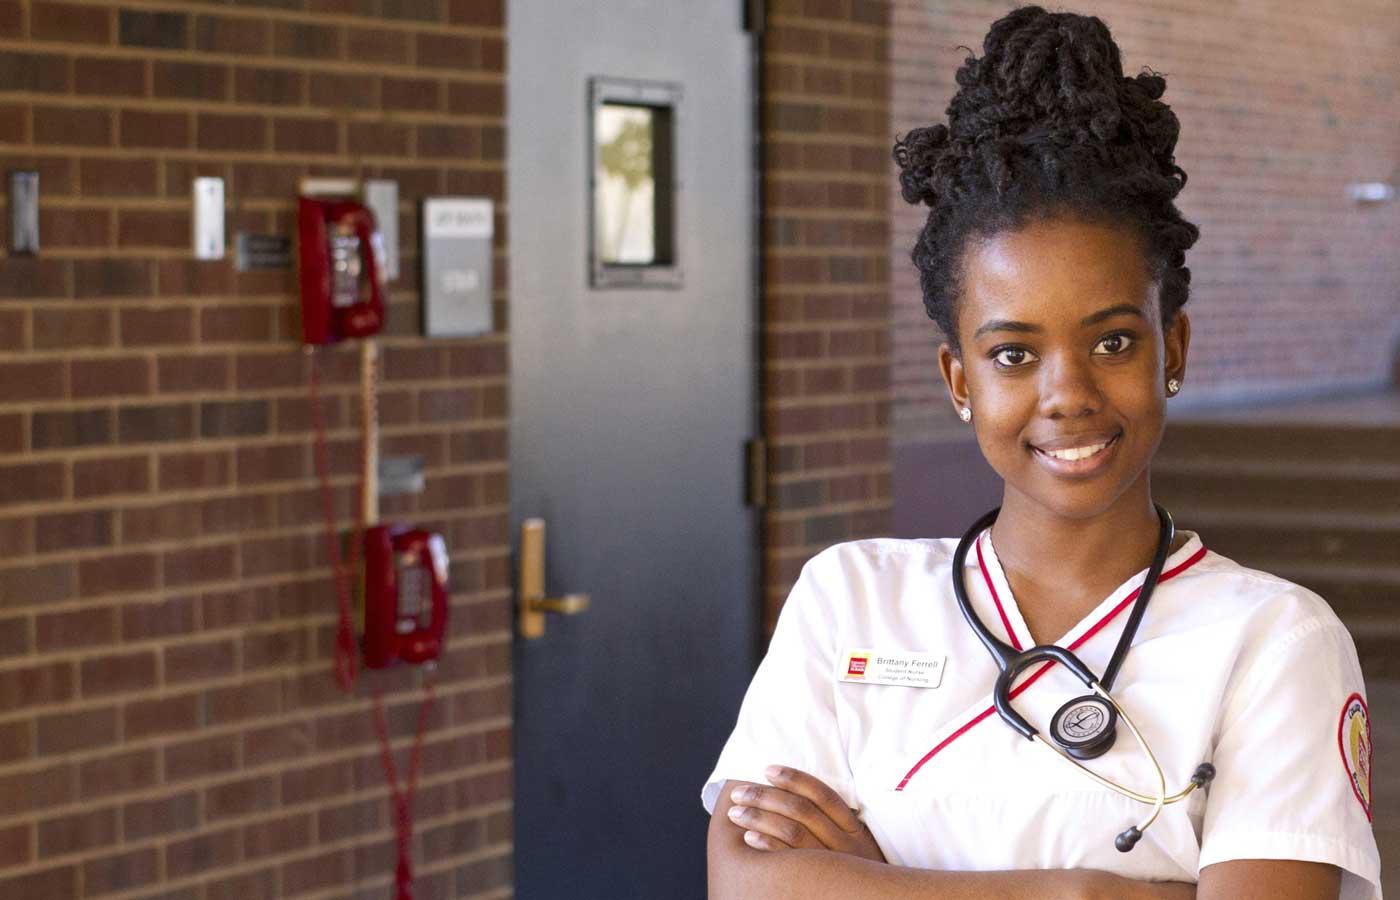 Akwa Ibom State School of Nursing Post Utme past Questions & Answers